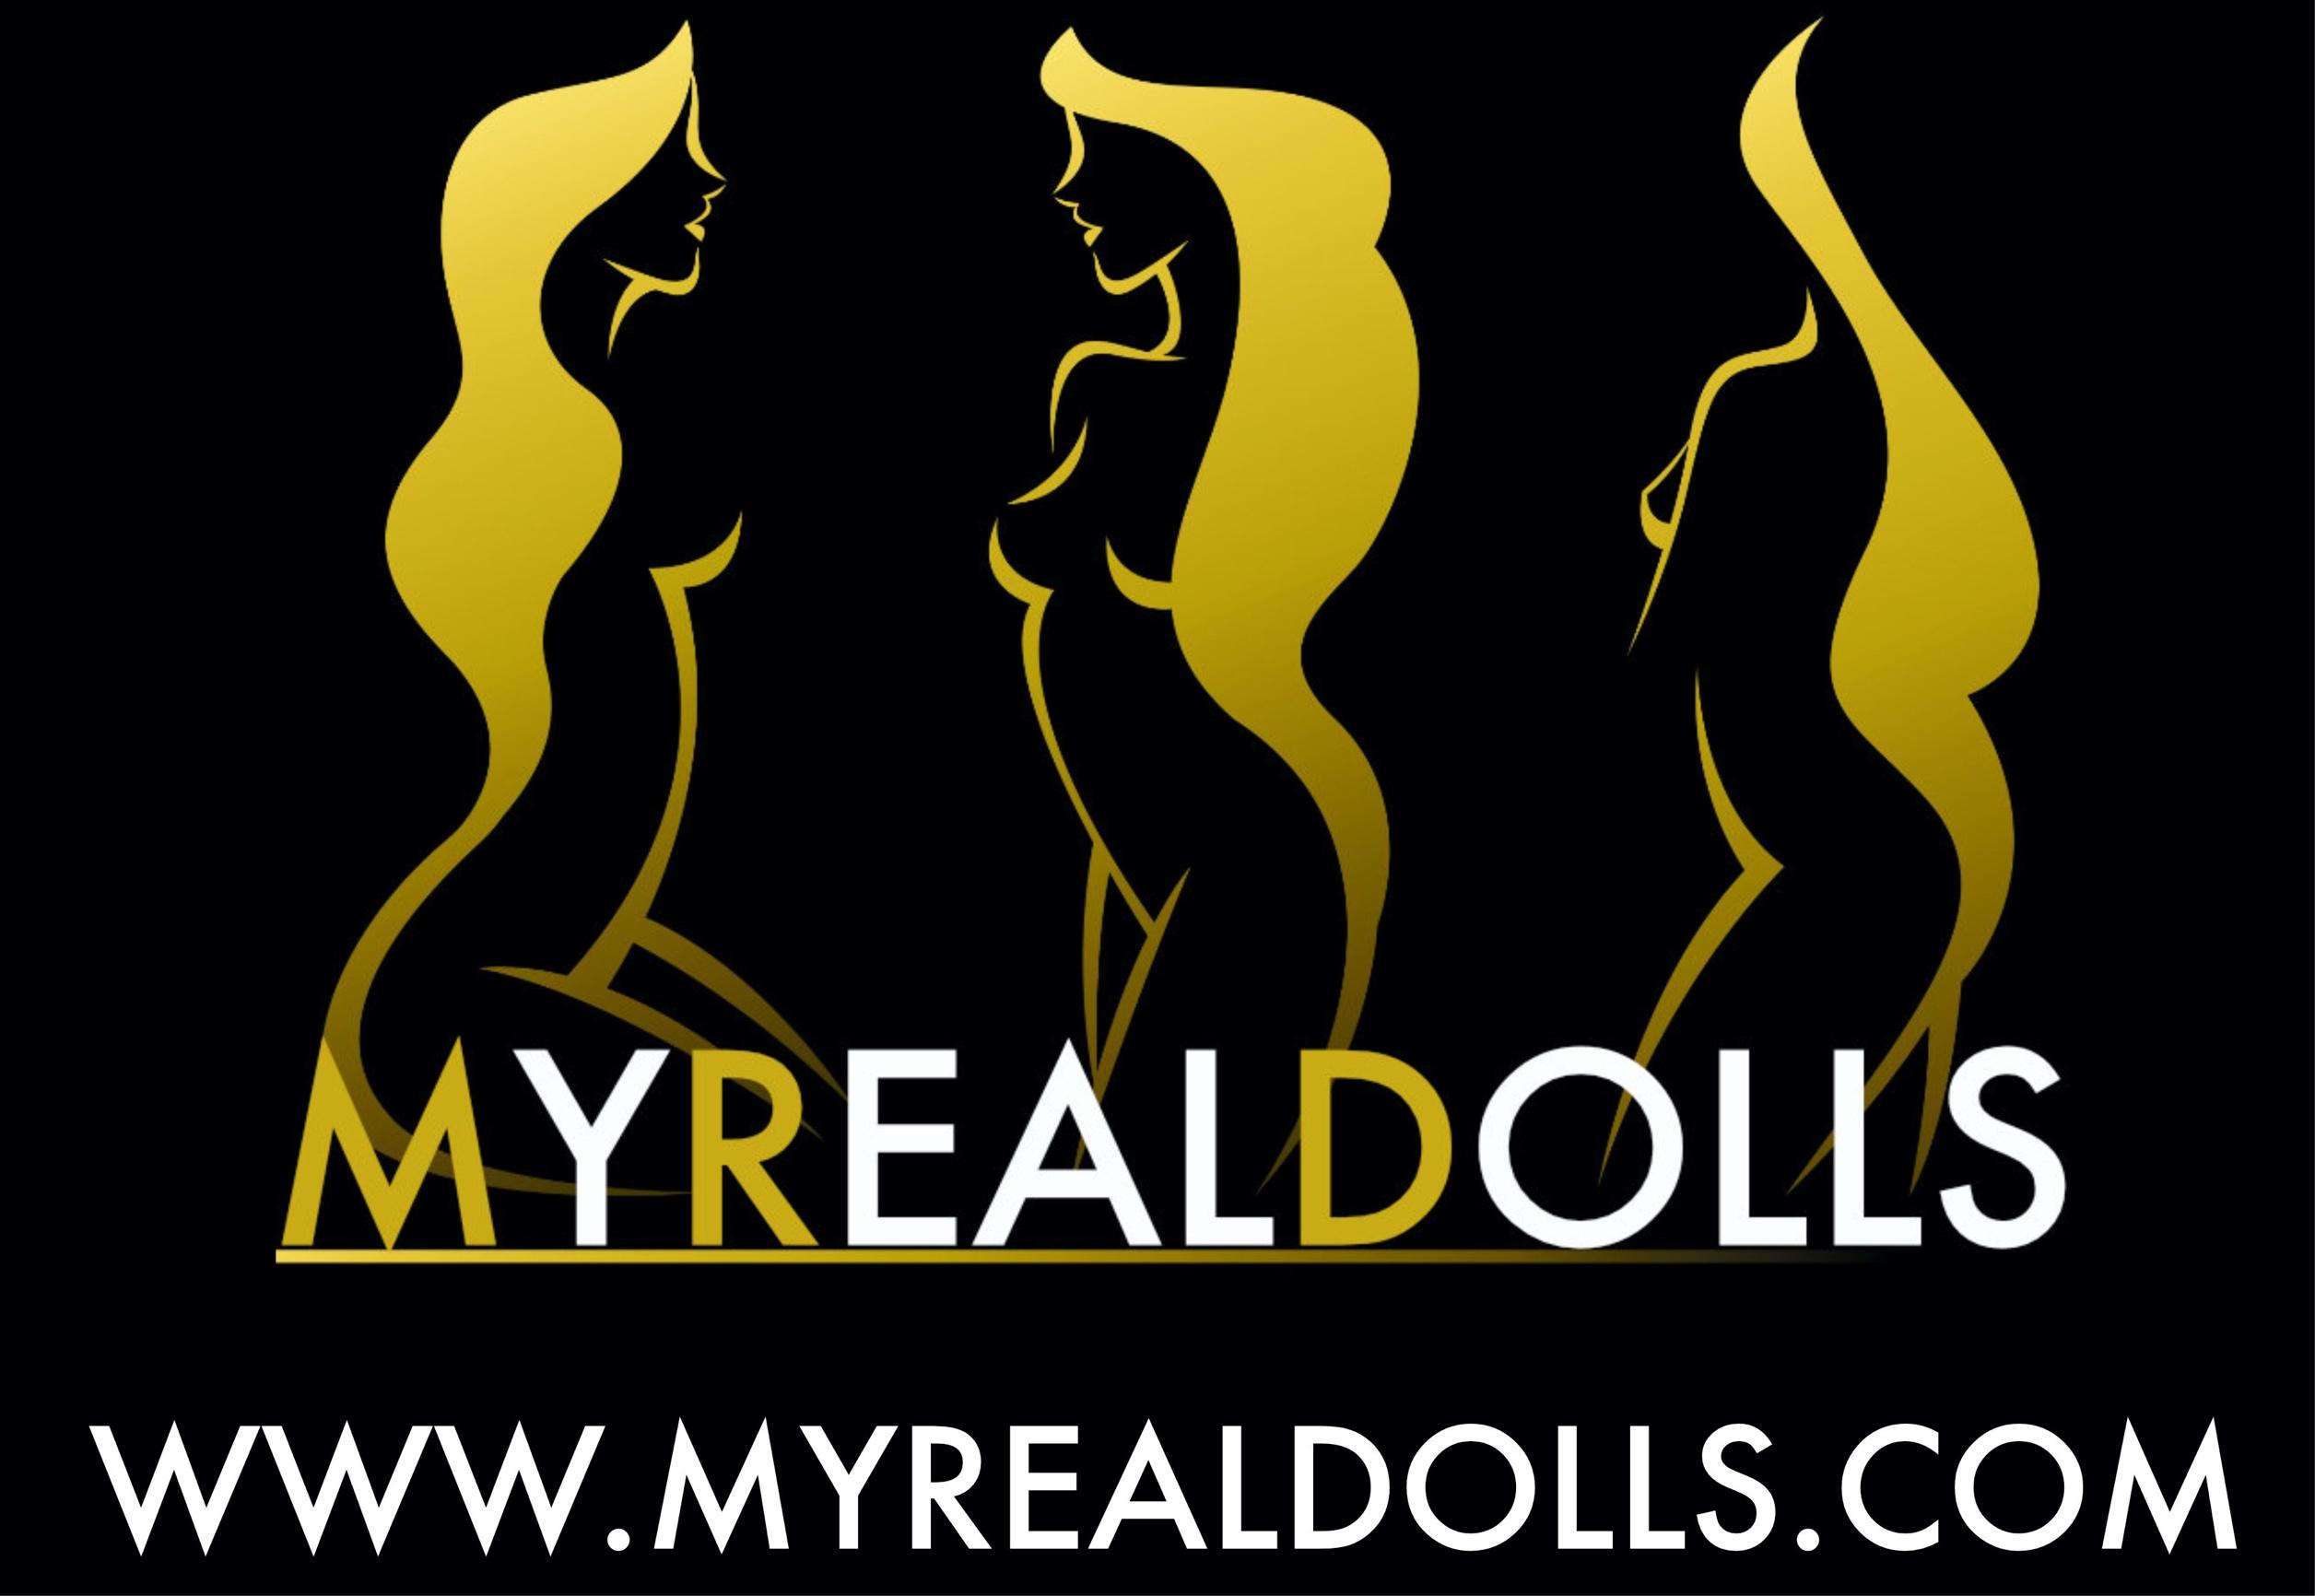 MyRealDolls